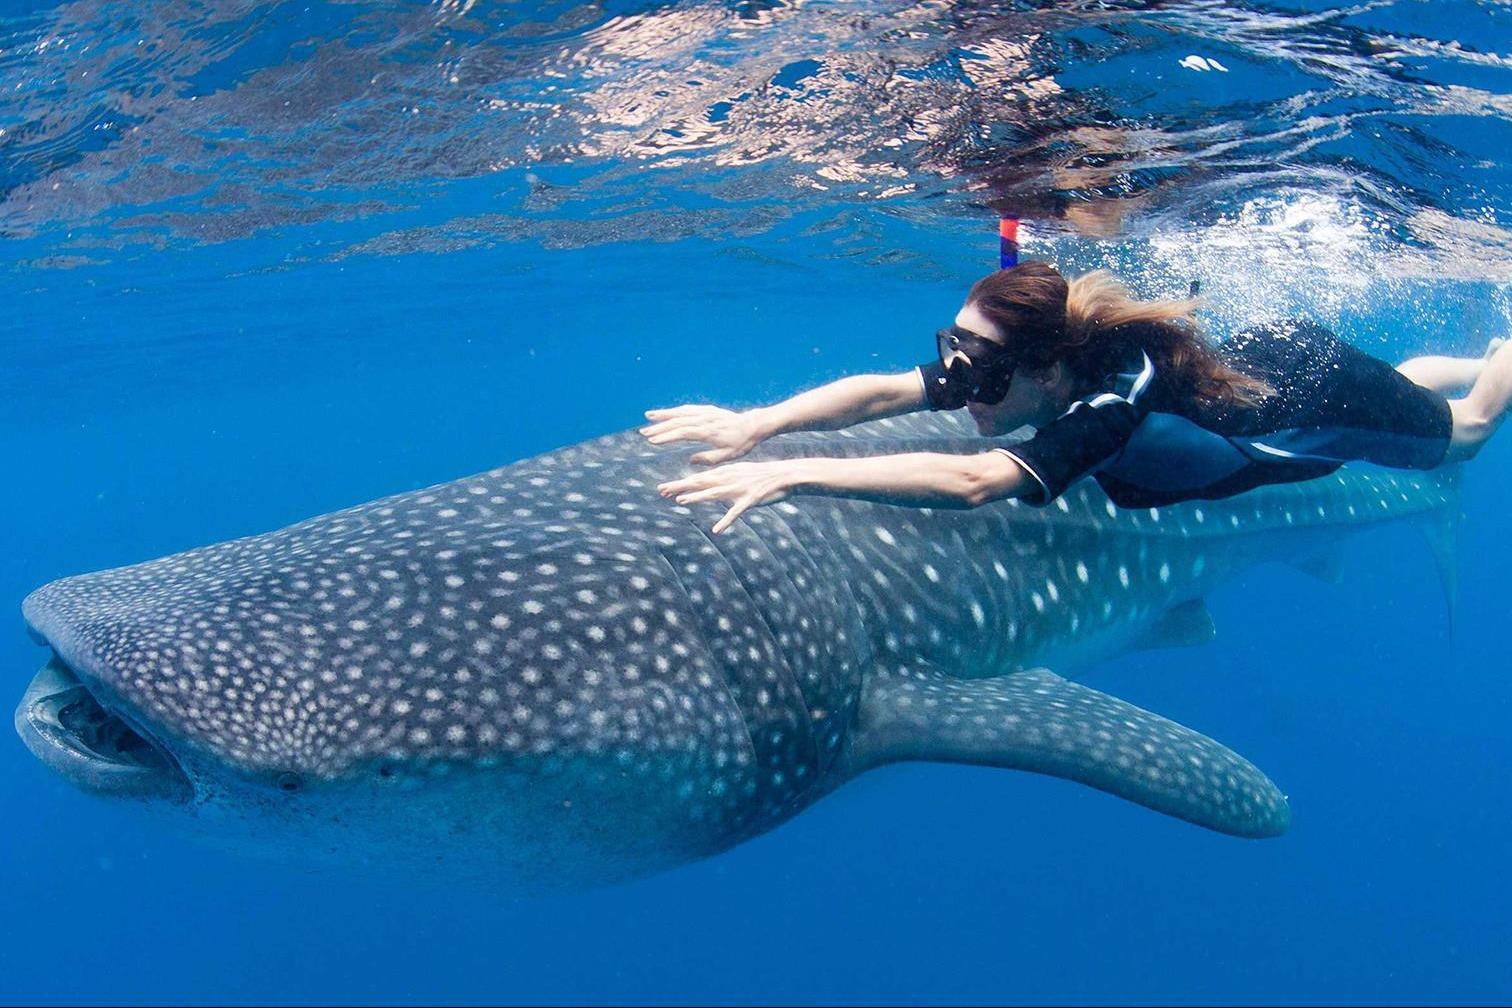 Lặn biển ngắm cá mập ở Philippines